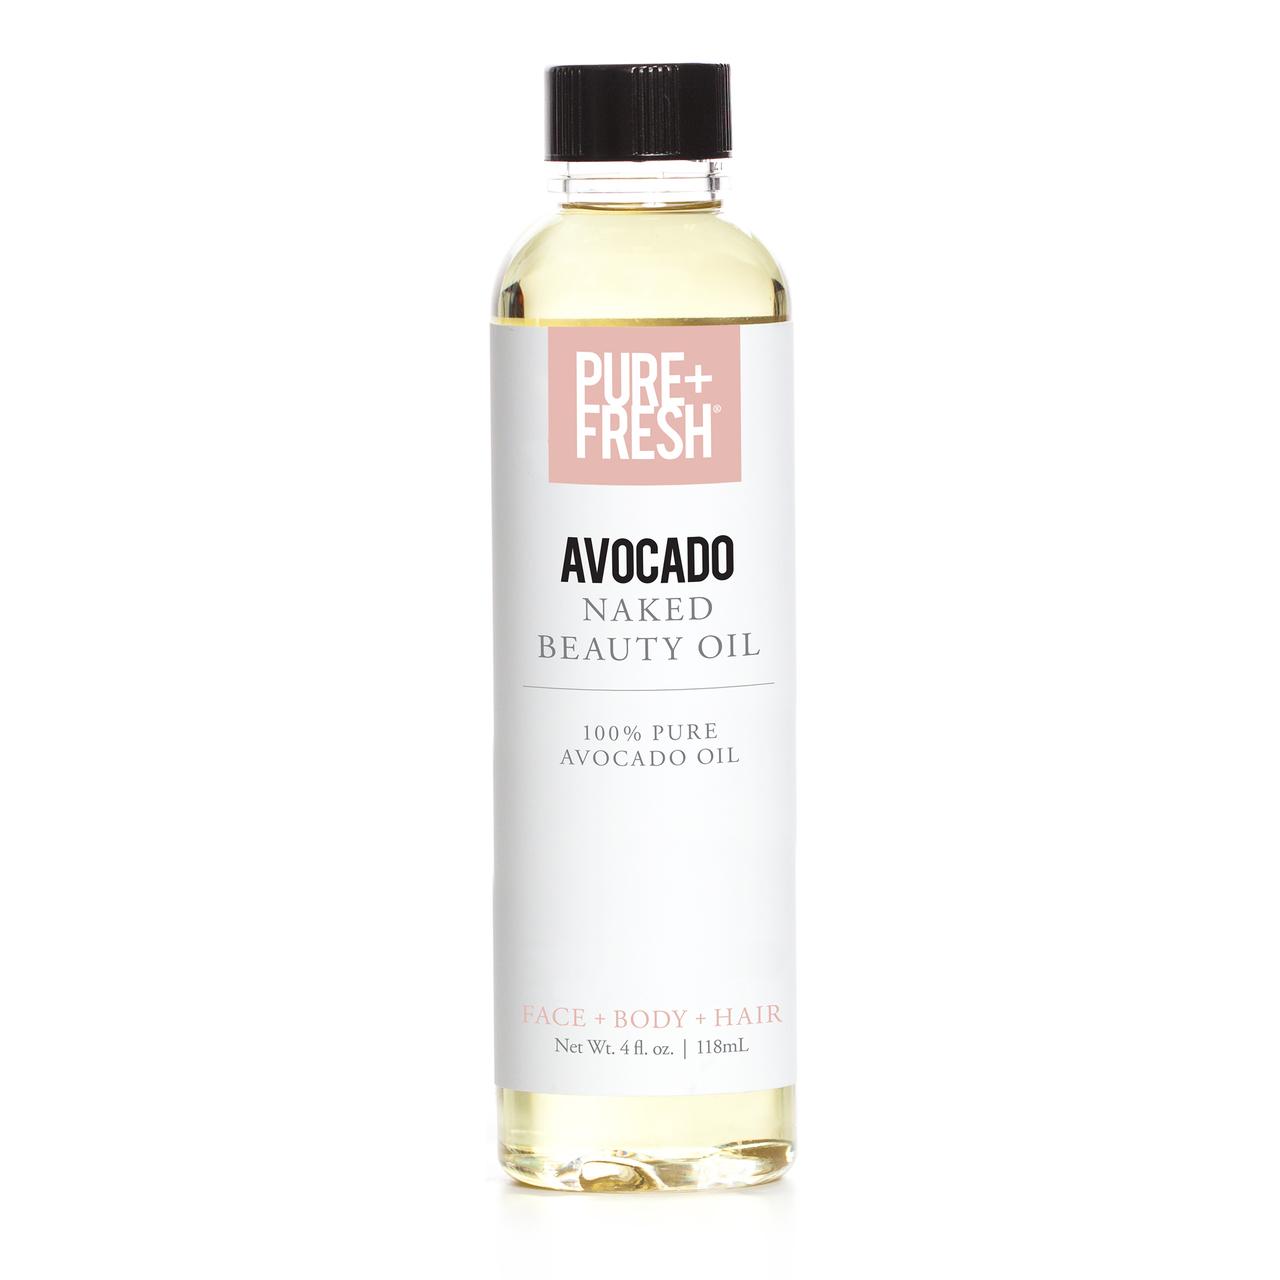 4.0 fl oz. Bottle of Pure+Fresh Fragrance Free Avocado Oil